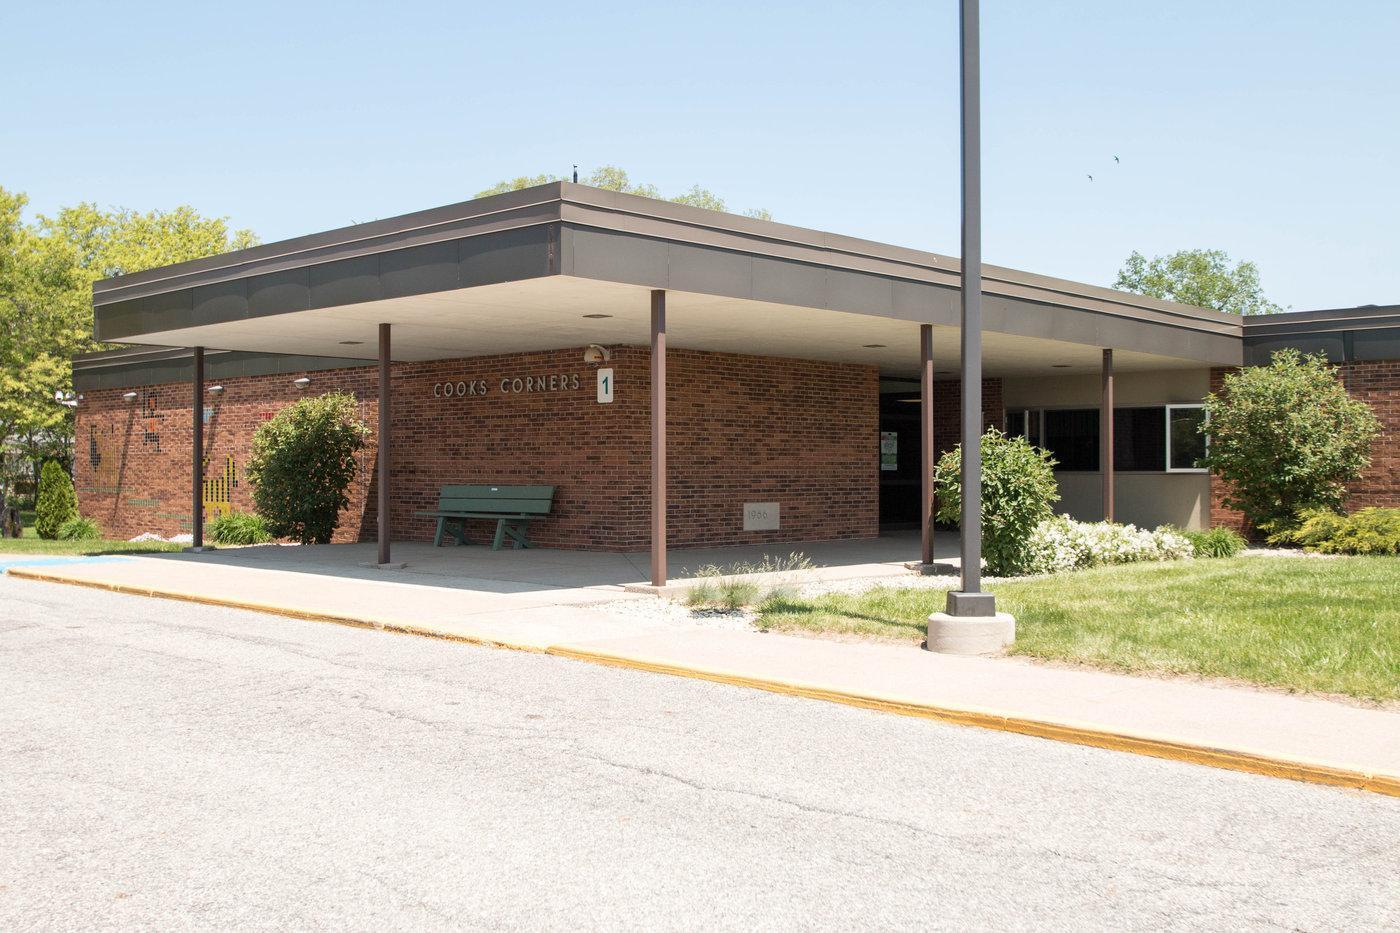 Cooks Corners Elementary School